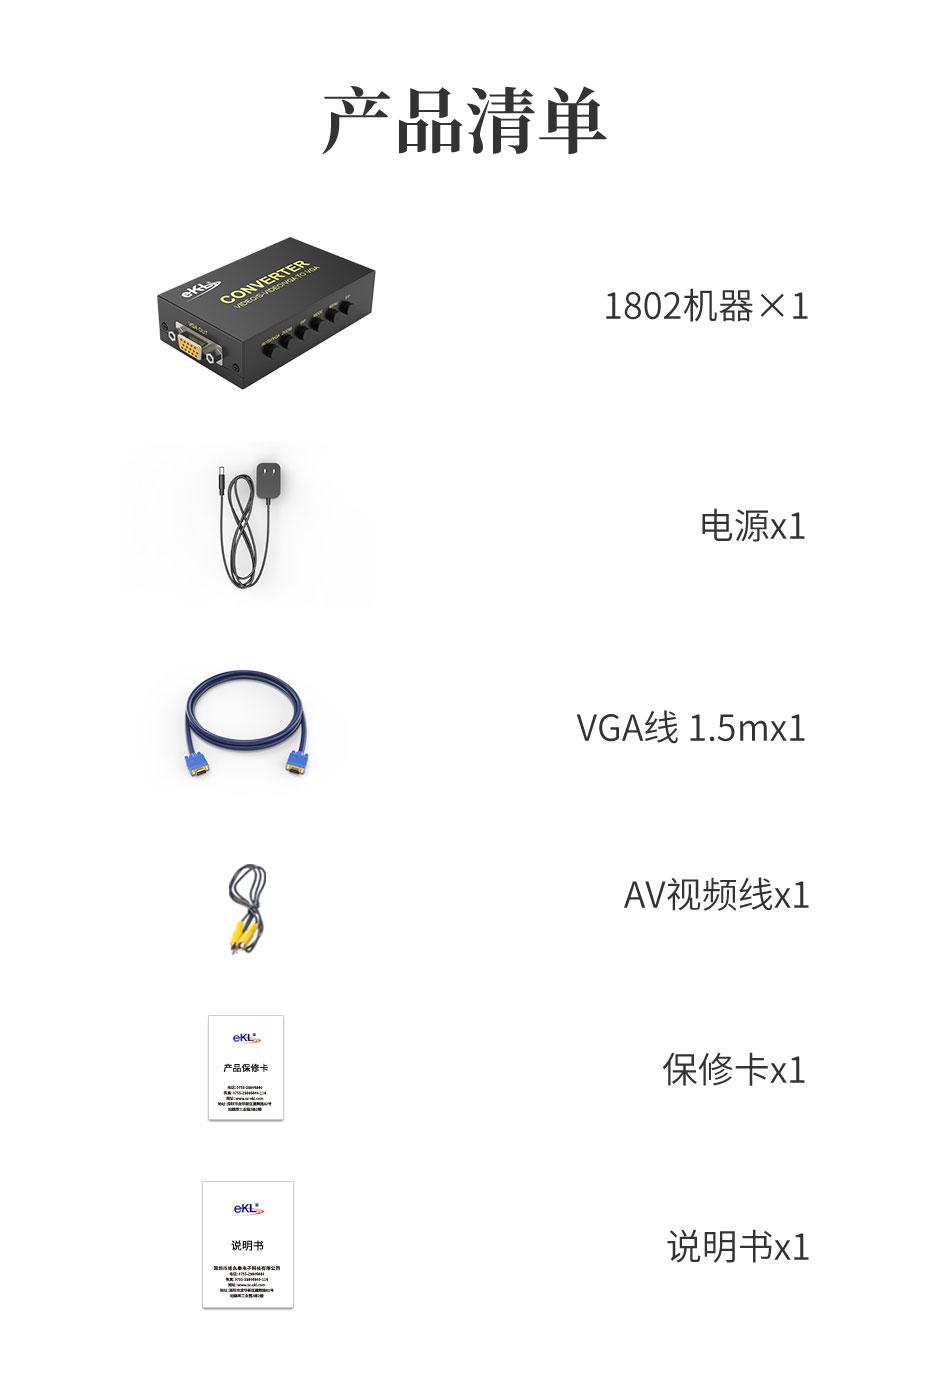 bnc转vga转换器1802标准配件